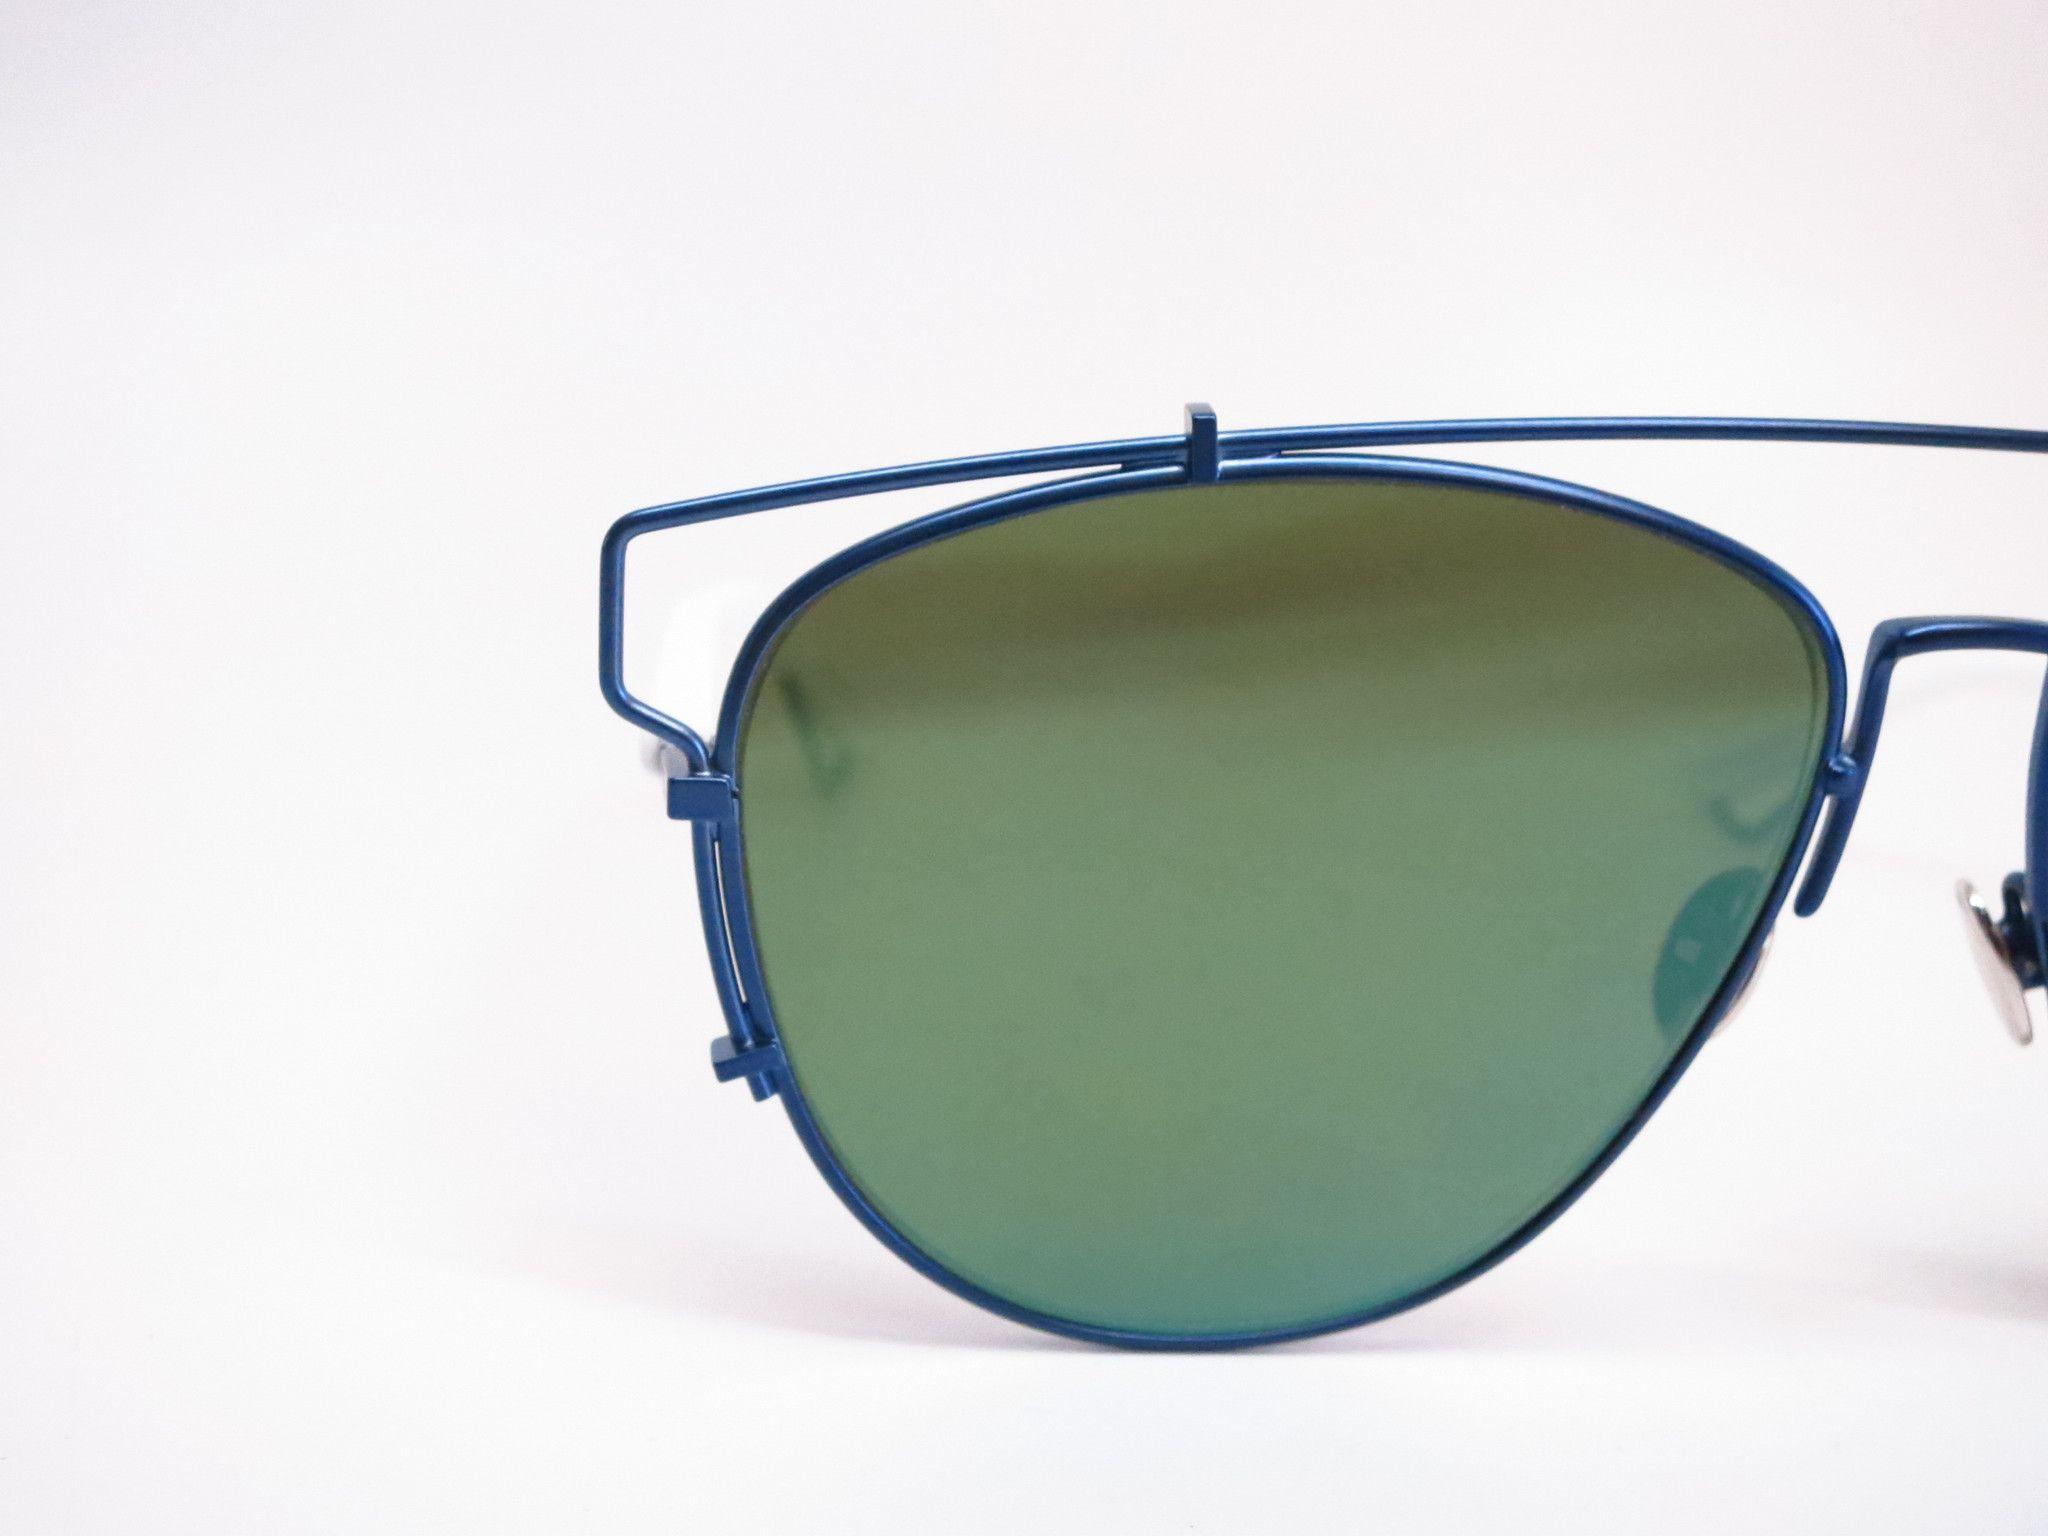 69471217f2c Dior Technologic Sunglasses Product Details Brand   Christion Dior Model  Name   Technologic Color Code